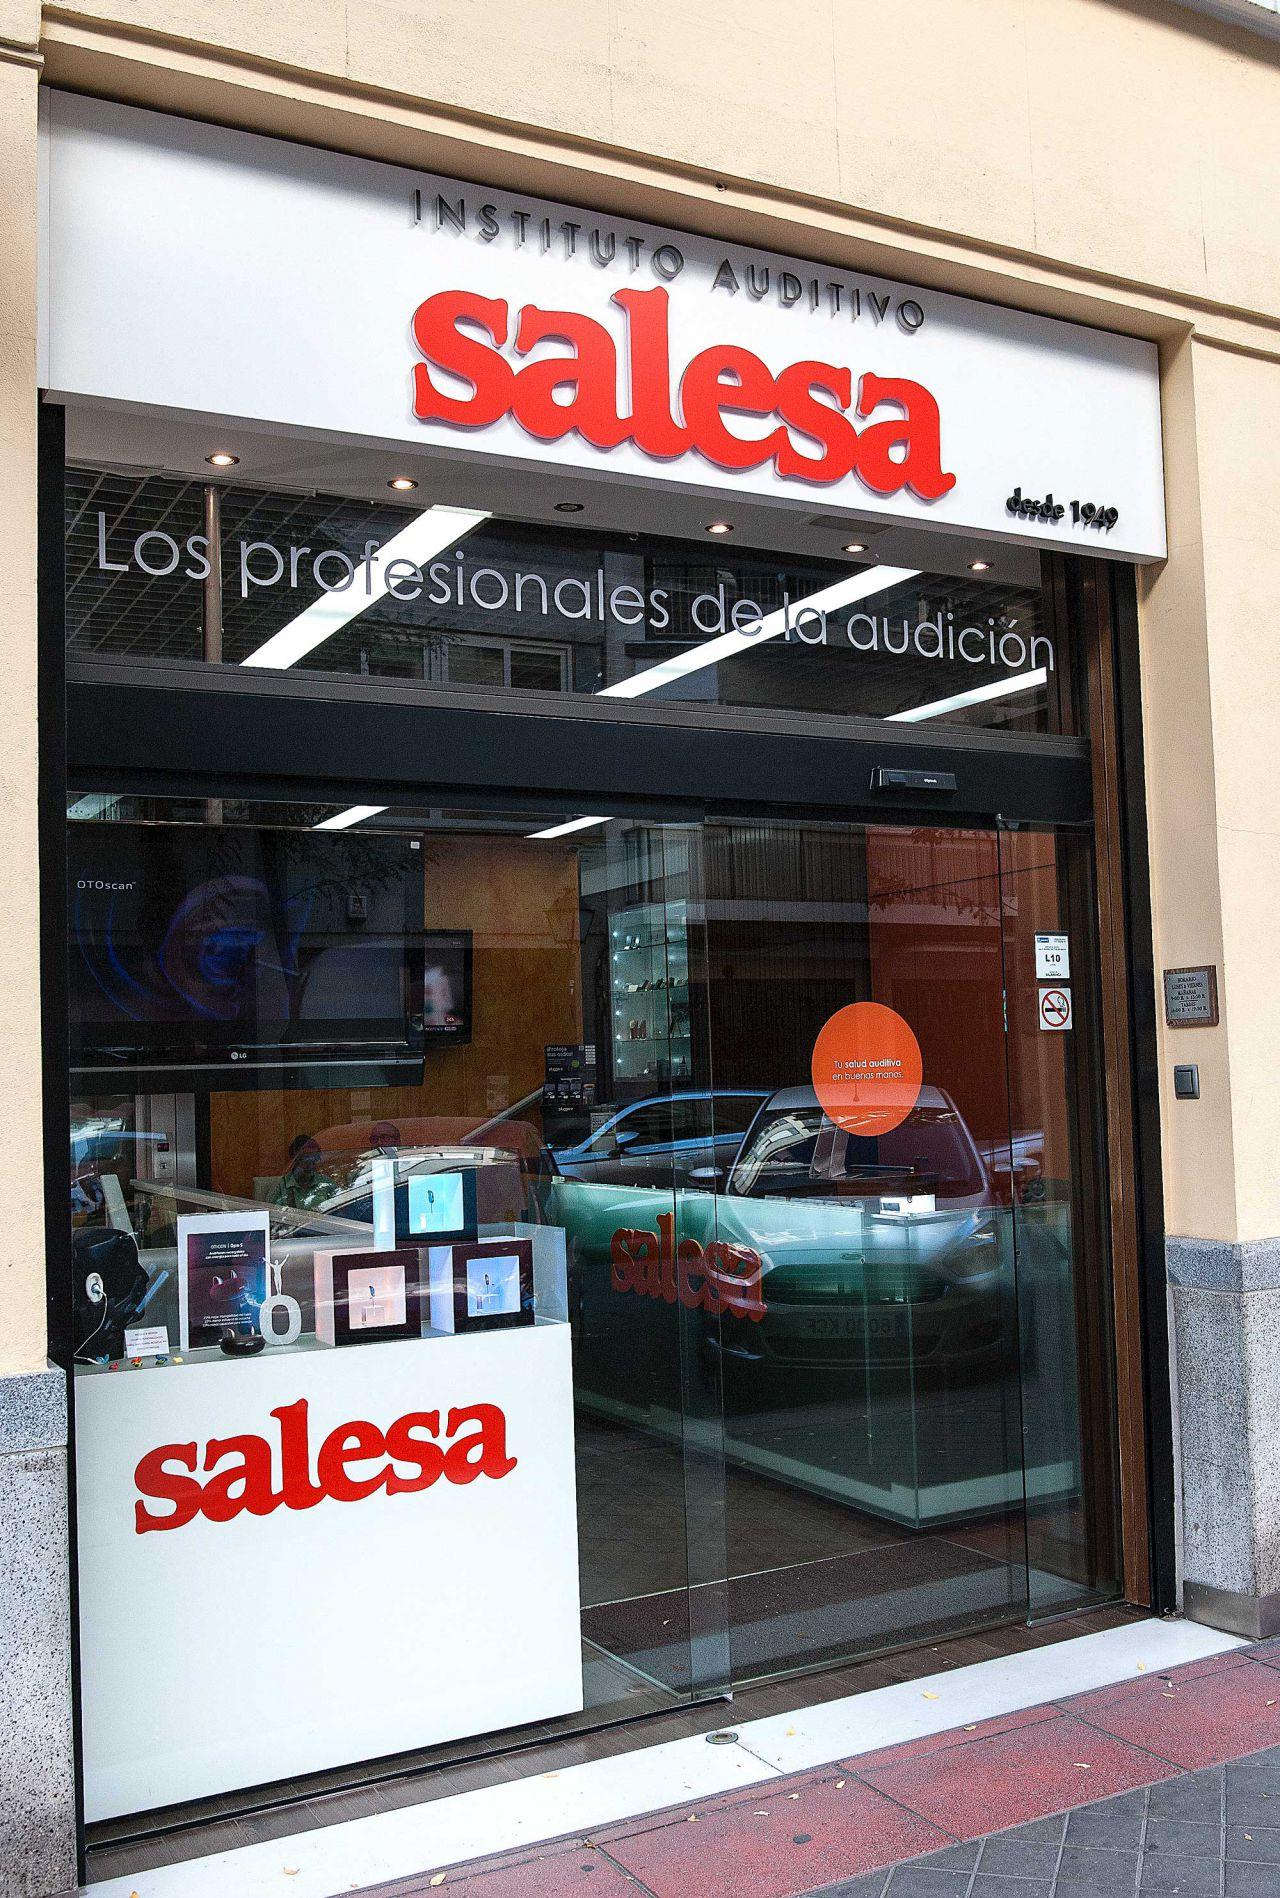 Nº 16. INSTITUTO AUDITIVO SALESA Tlf. 915 21 78 79  www.salesa.es